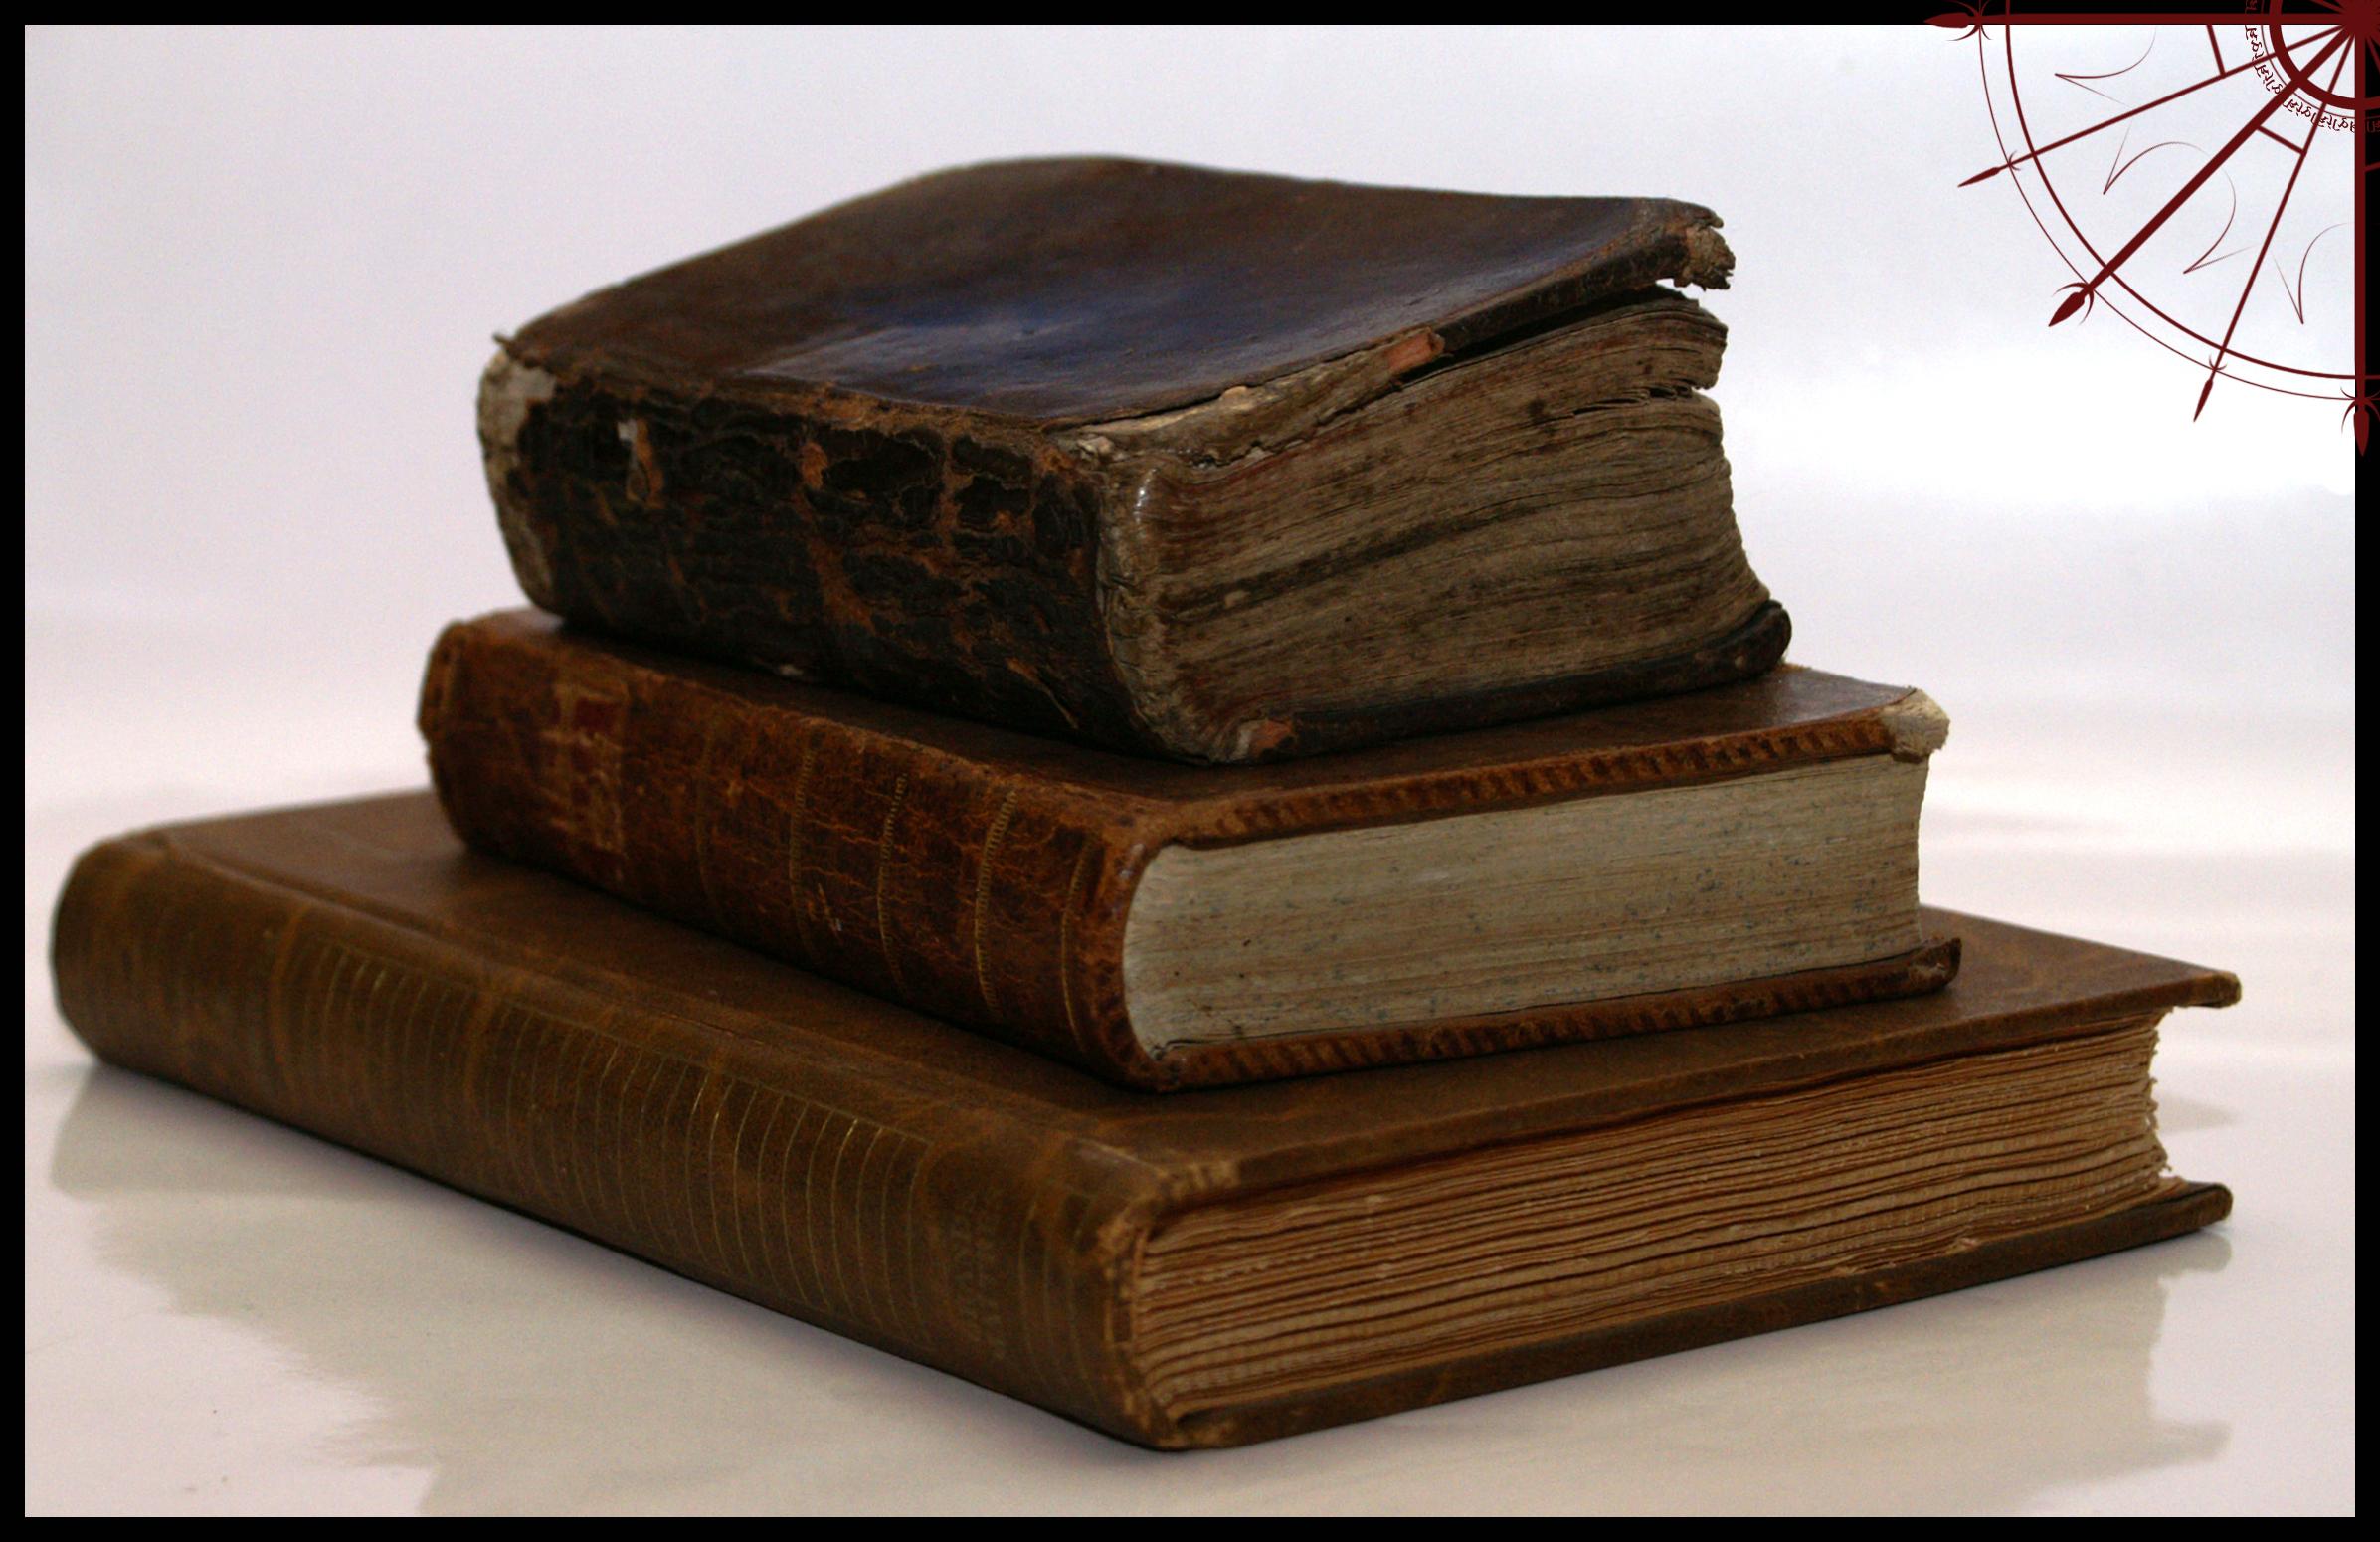 002 - Books Old